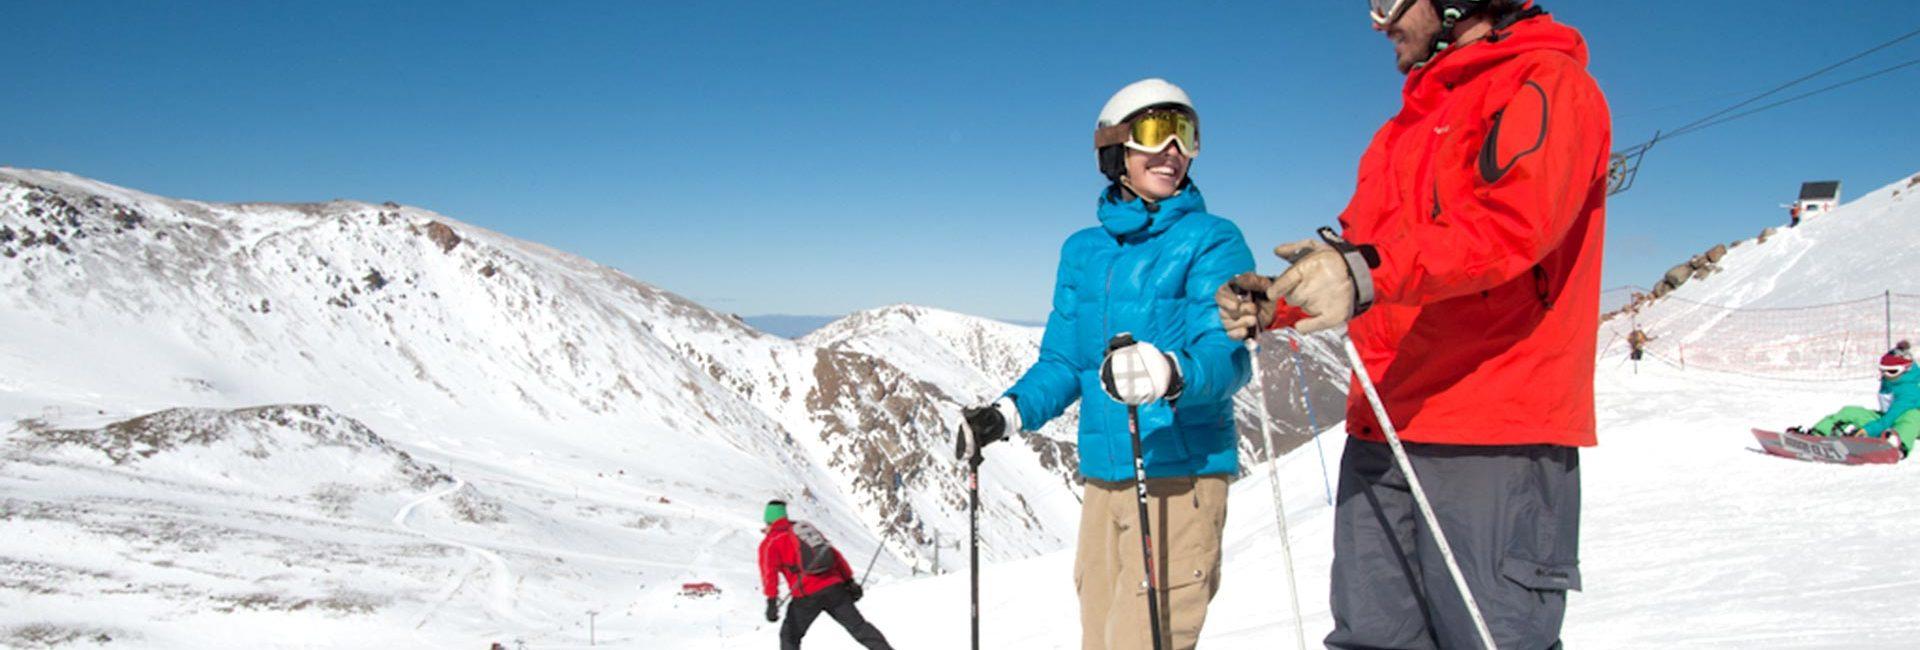 FS Ski Week, disfrutá una semana en la nieve!